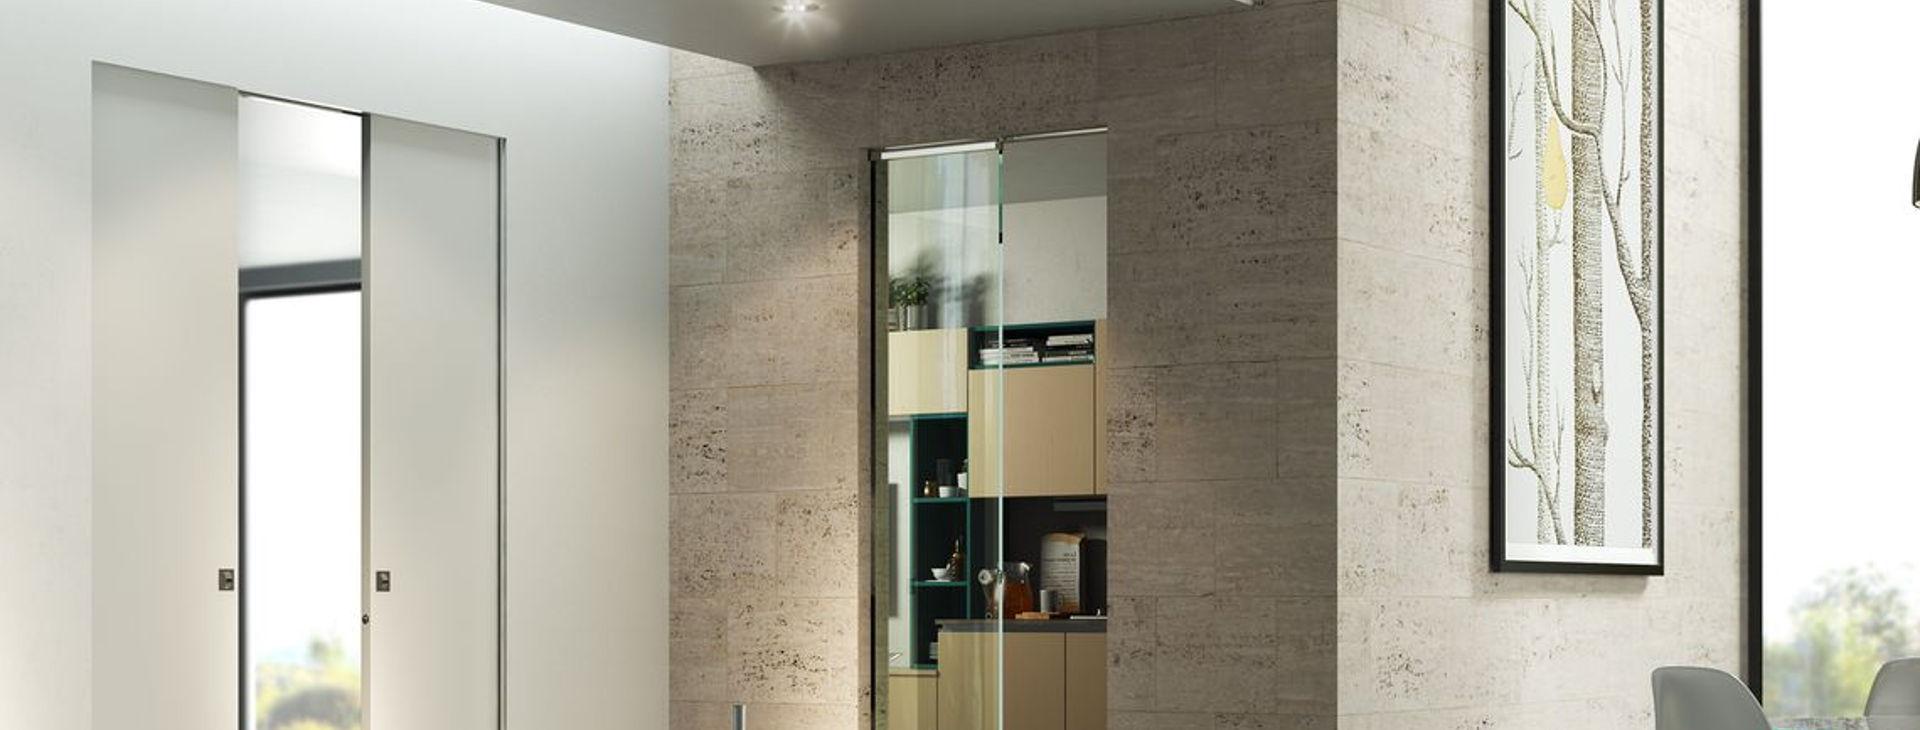 zatahovacie dvere - essential Scrigno